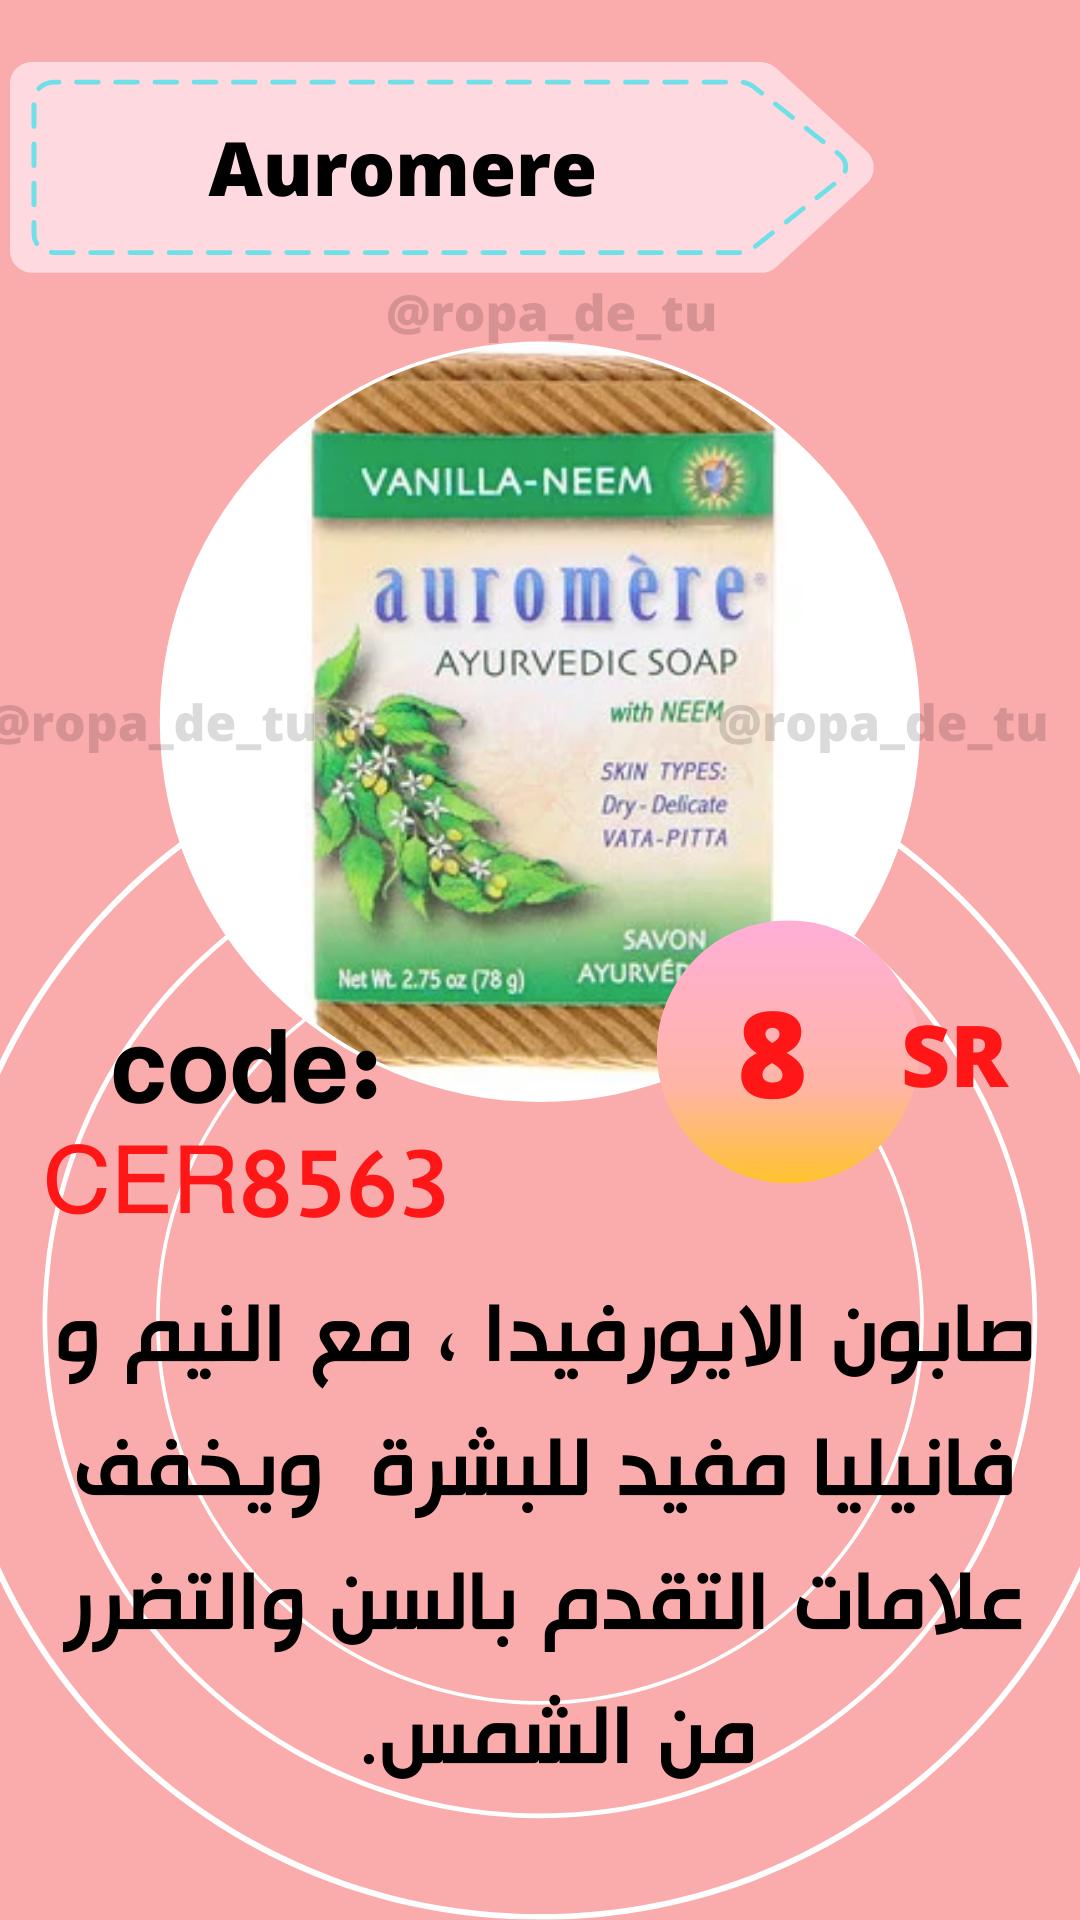 Auromere Ayurvedic Soap With Neem Vanilla Neem 2 75 Oz 78 G Ayurvedic Soap Paraben Free Products Soap